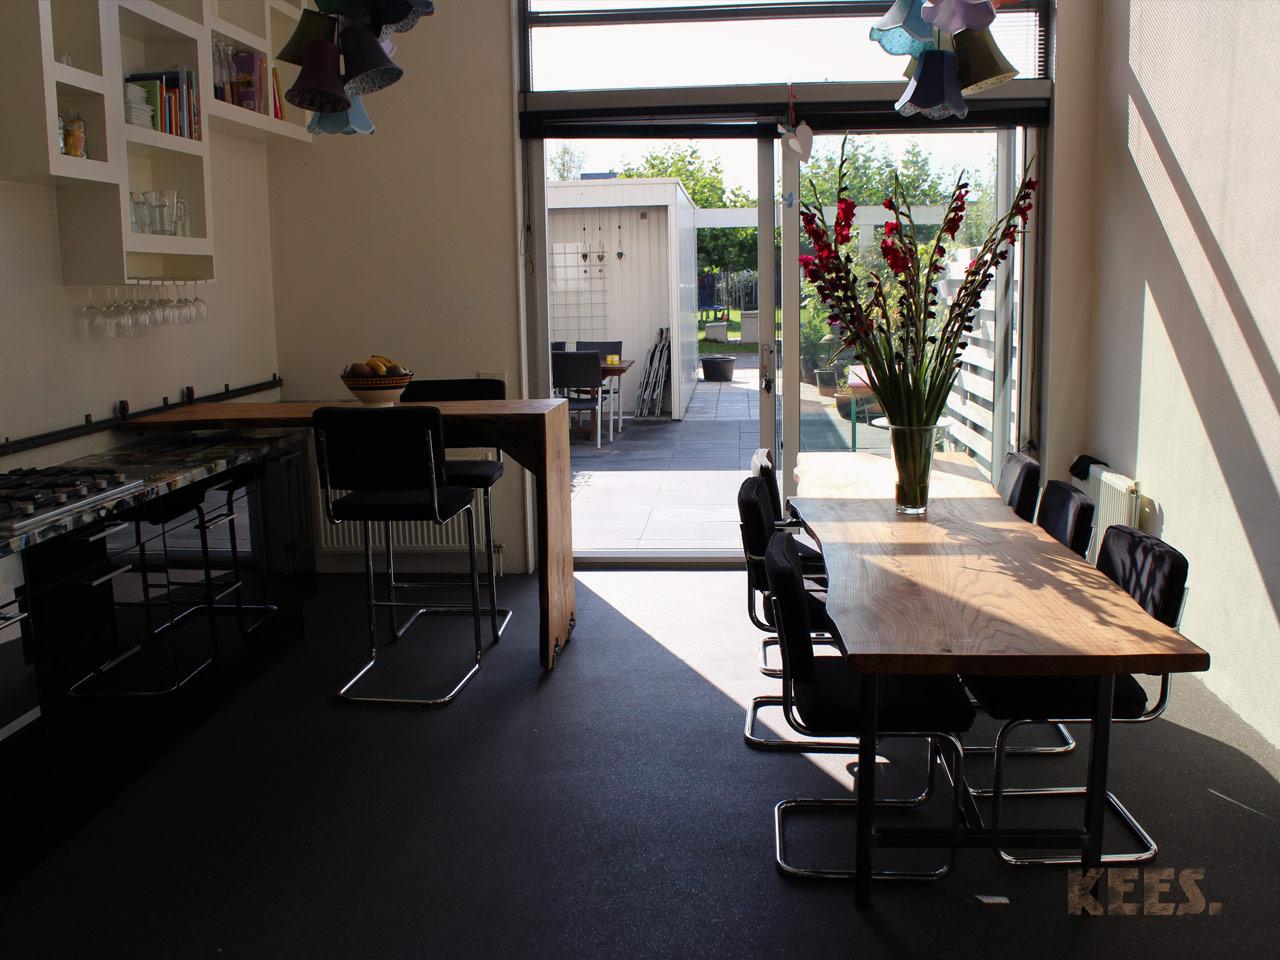 Idee keukentafel eiland - Keuken met bar tafel ...